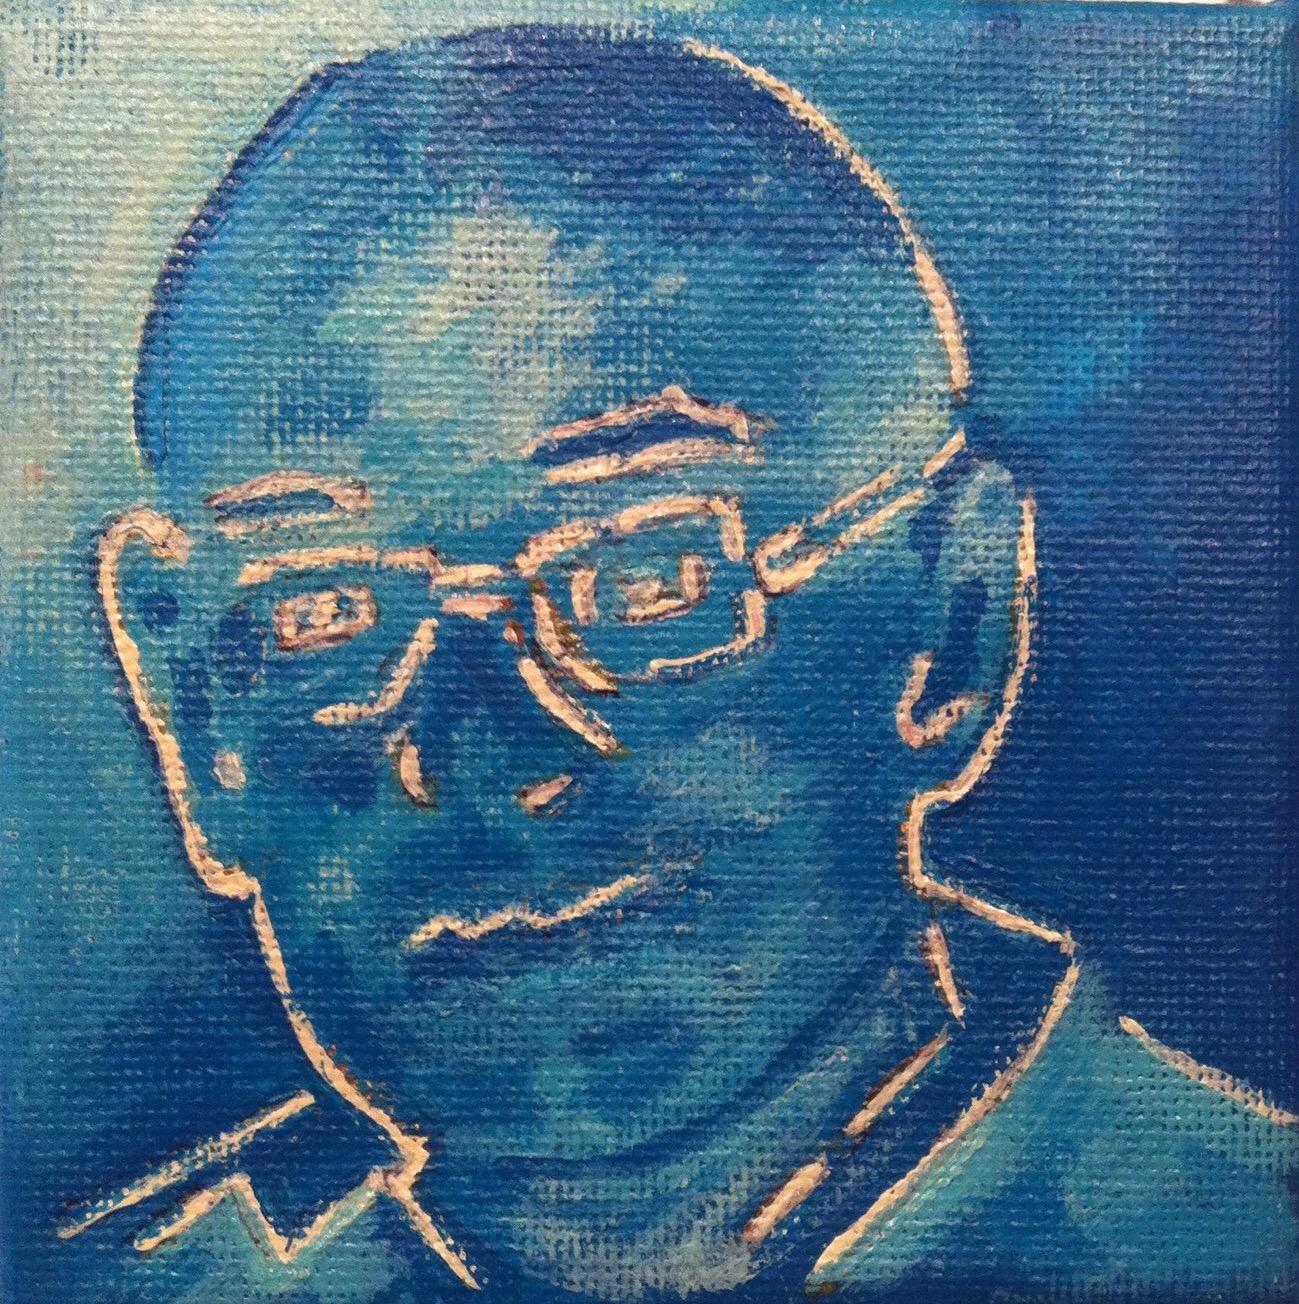 Portret - In opdracht Acryl op doek (10 x 10)